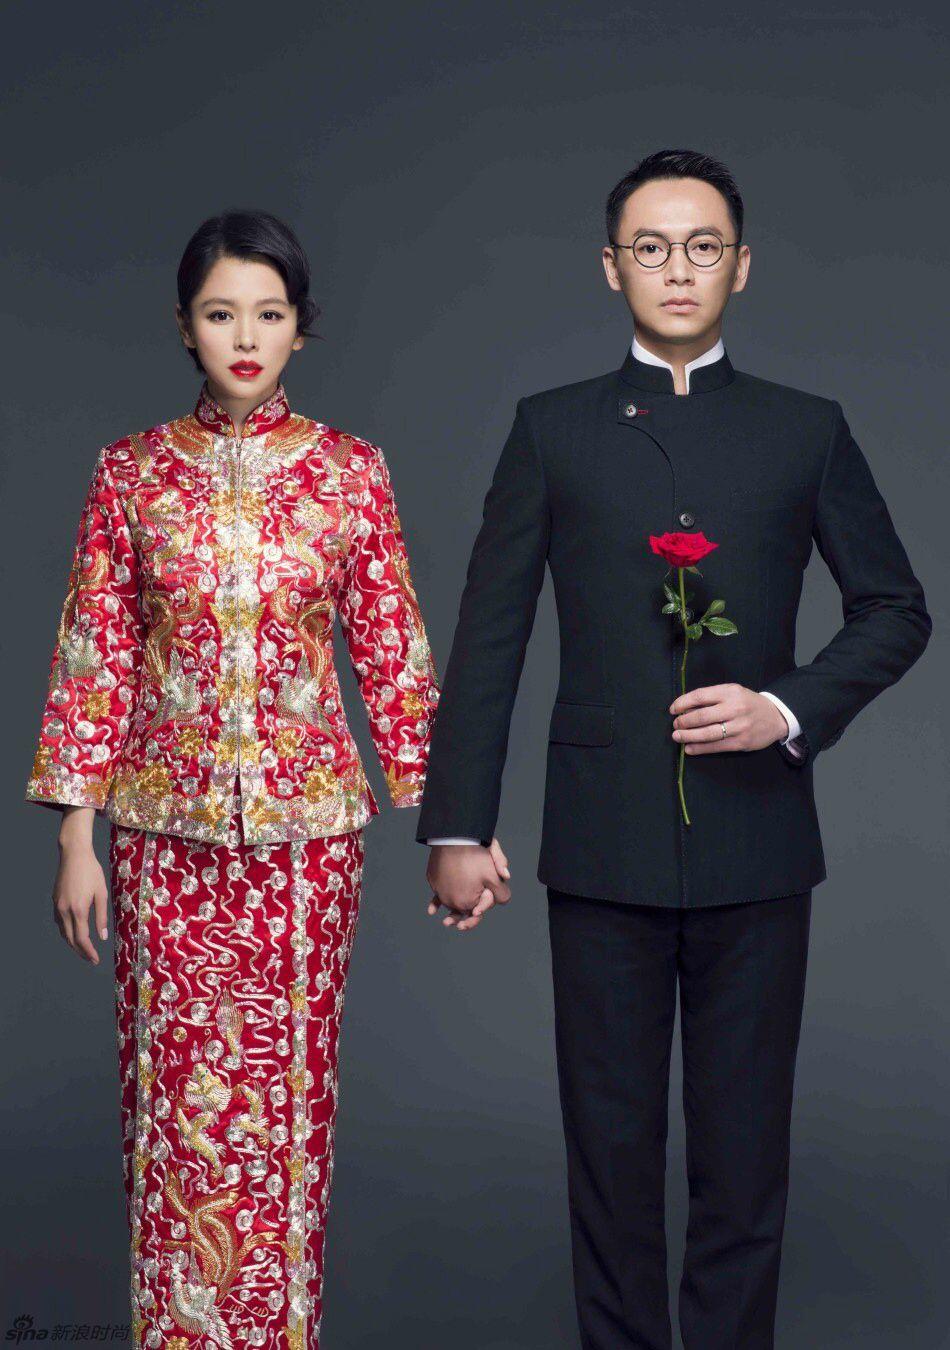 Photo Style Chinese Wedding Dress Traditional Chinese Wedding Chinese Wedding Photos